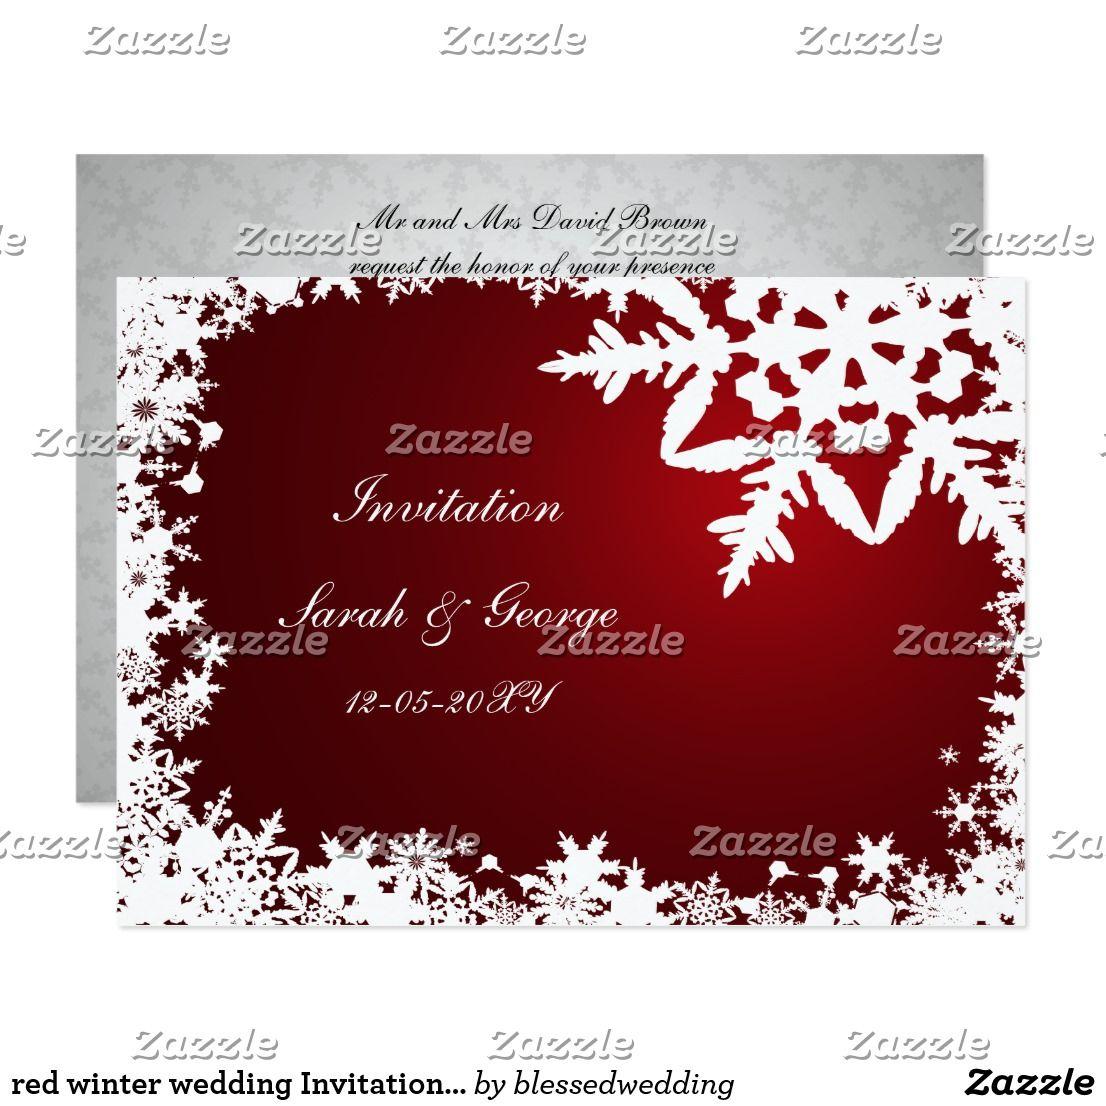 red winter wedding Invitation cards | Red winter weddings, Winter ...